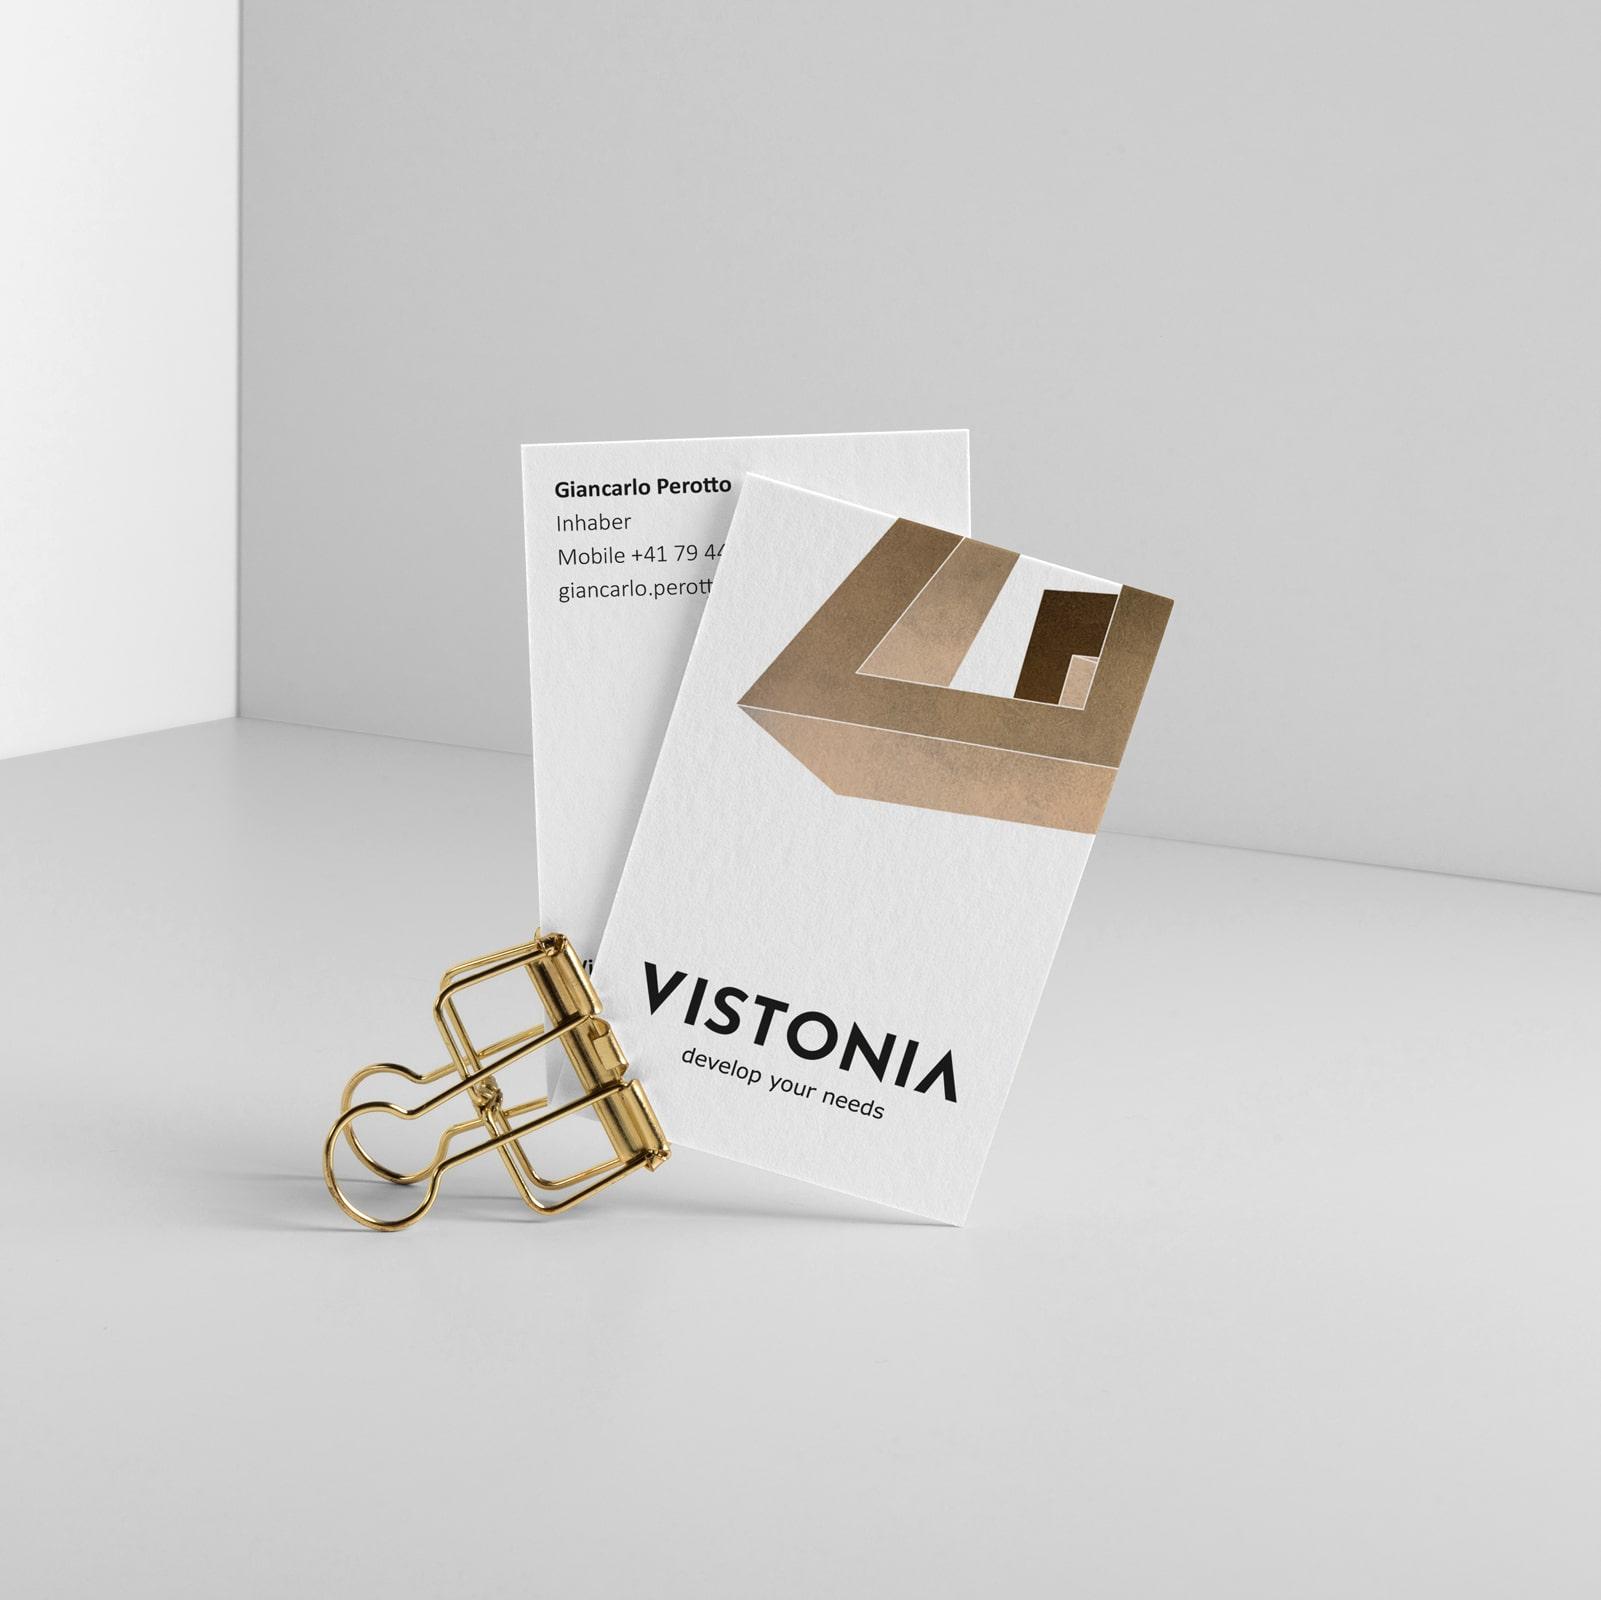 consulting branding Vistonia